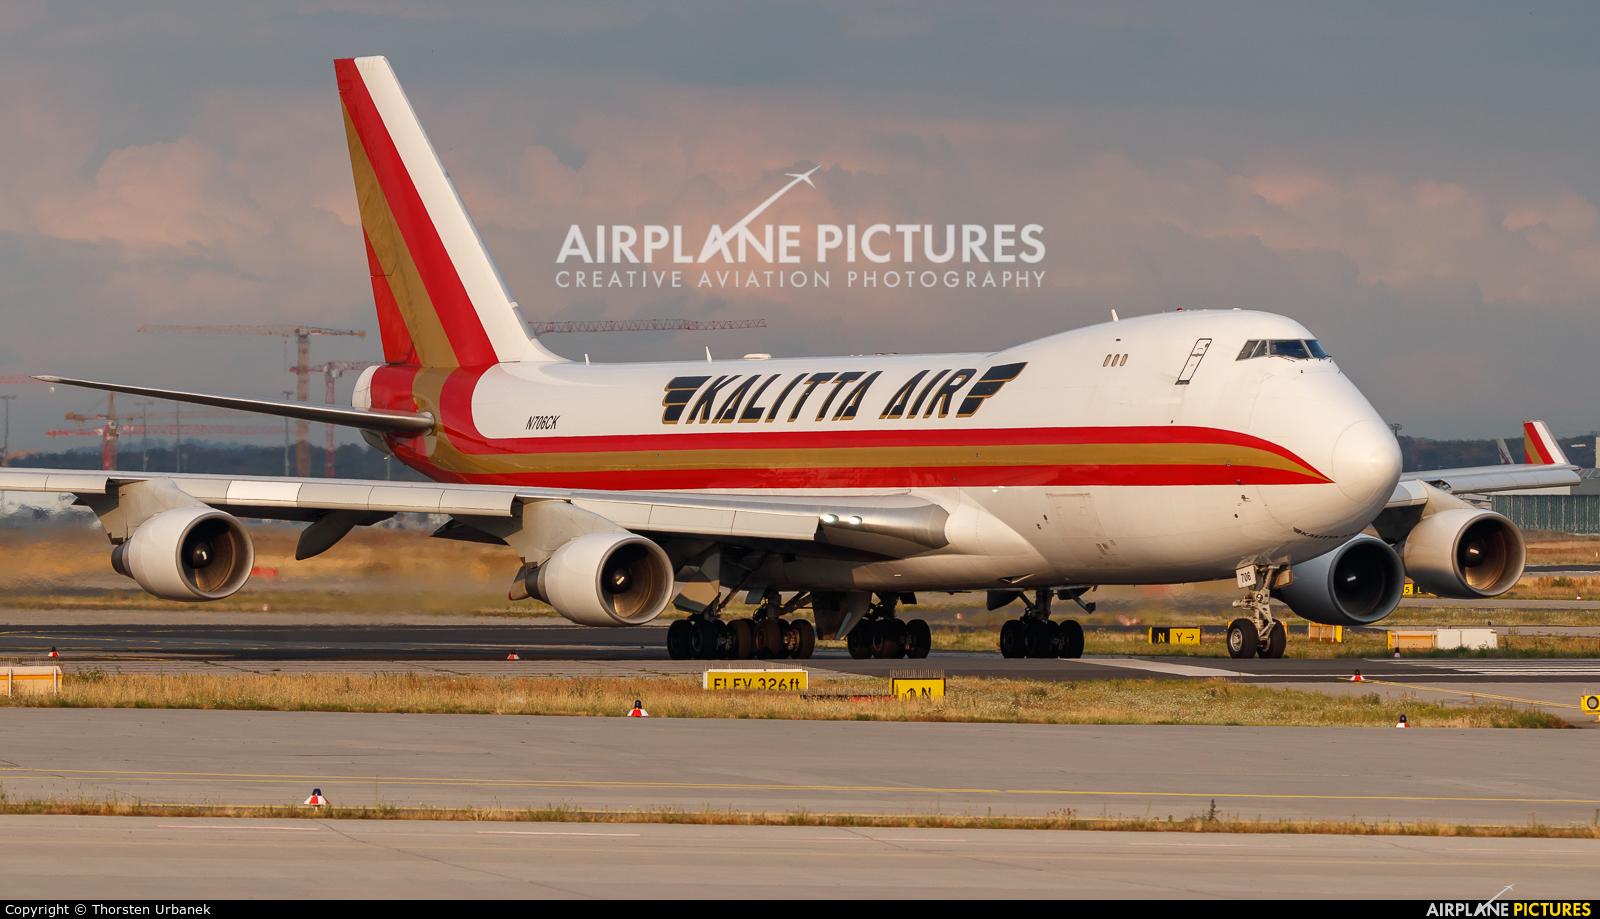 Kalitta Air N706CK aircraft at Frankfurt